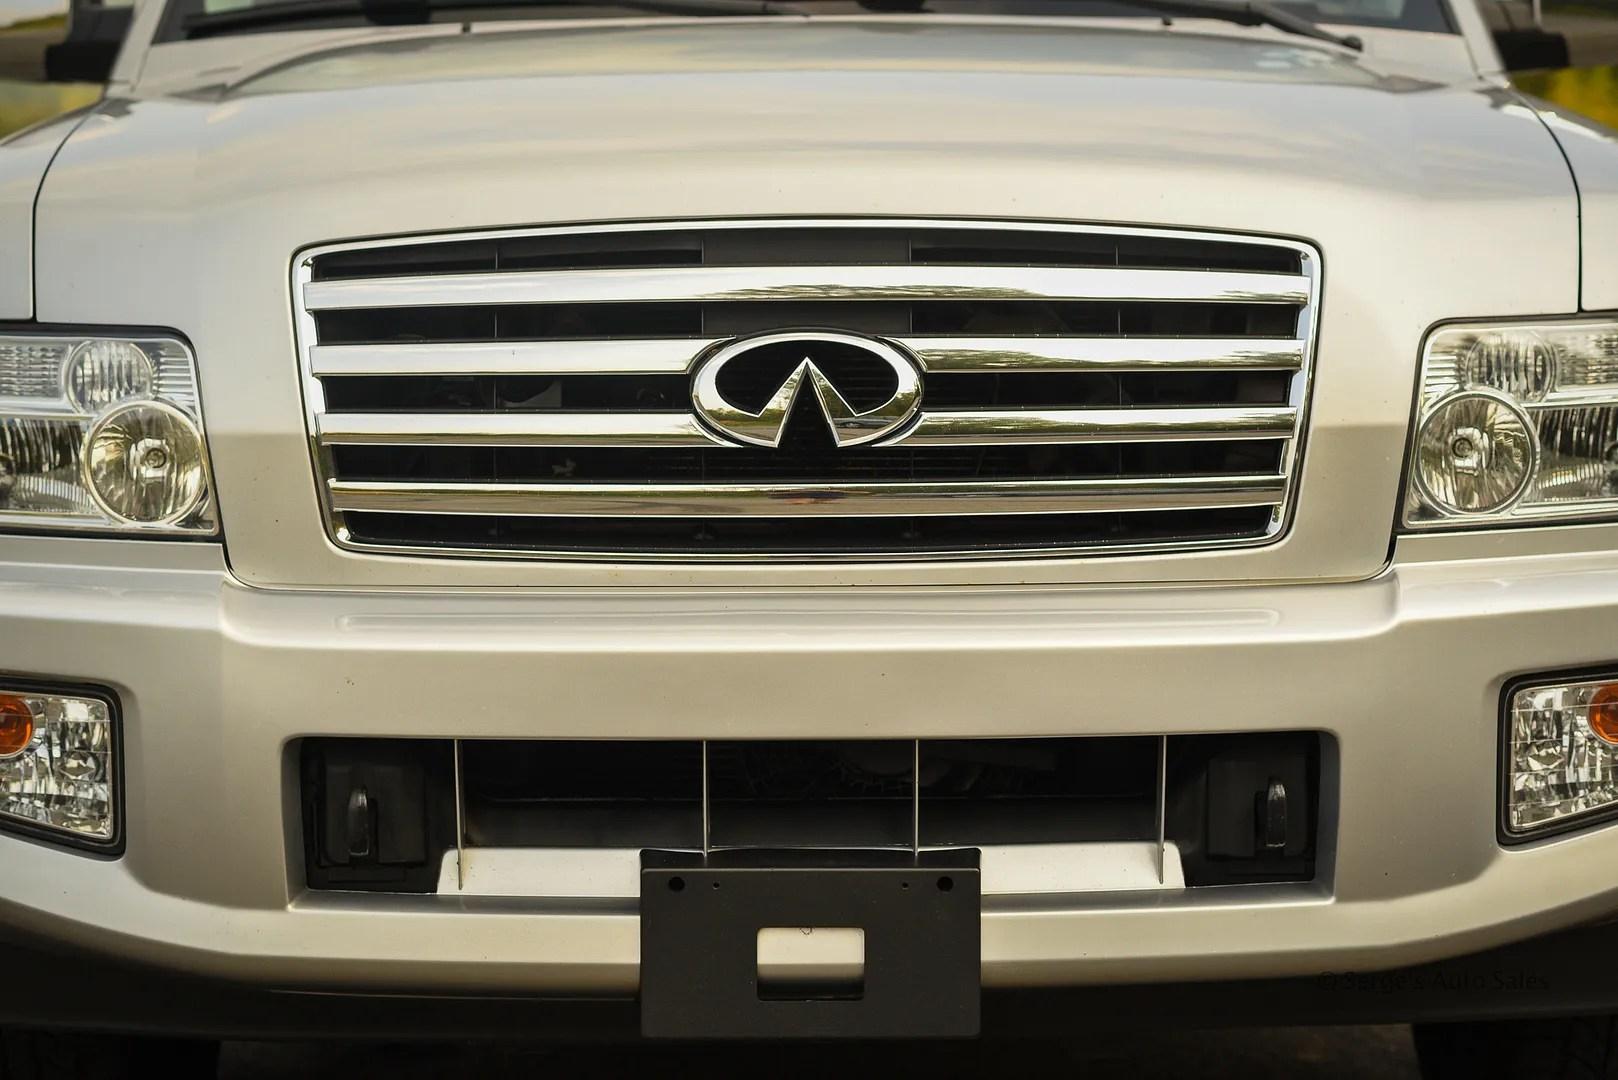 photo Infiniti-Serges-Auto-Sales-Car-dealer-Pennsylvania-QX56-Scranton-Nepa-29_zpsmbtslqcf.jpg